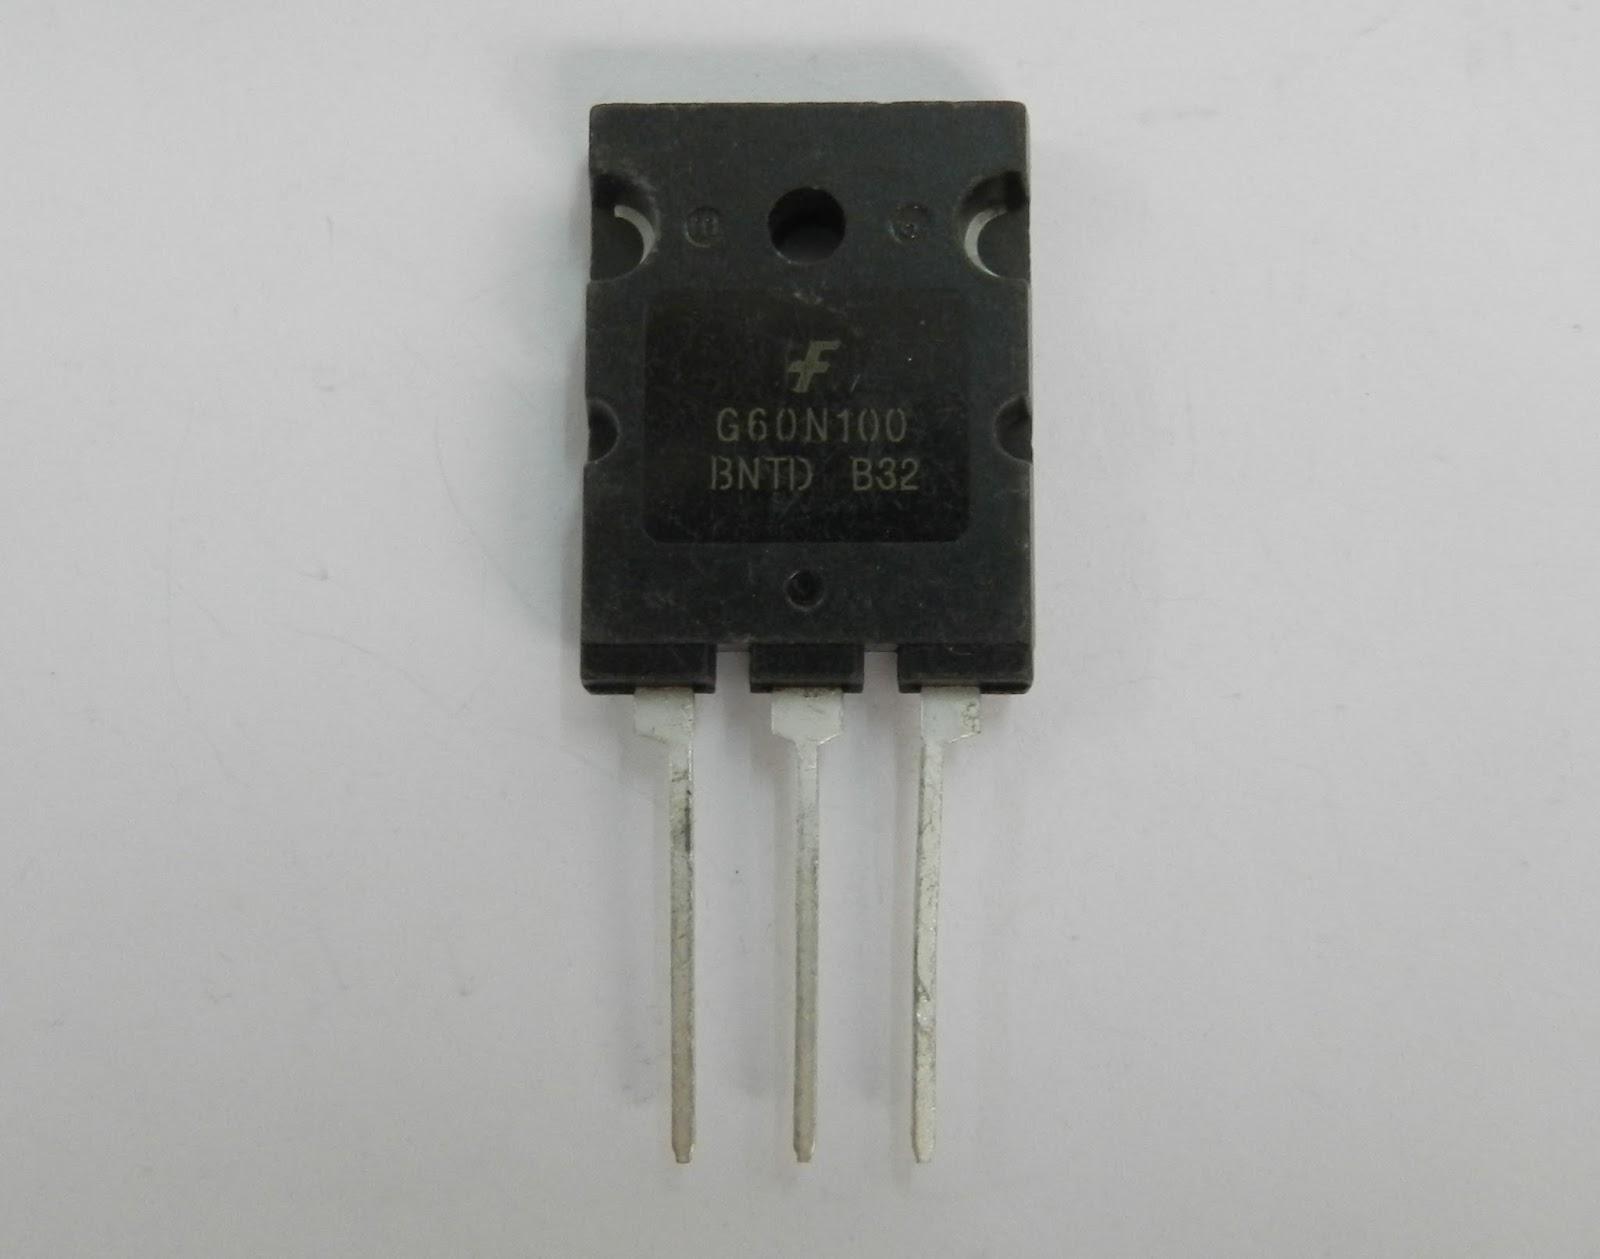 Electronics Part Reviews: FGL60N100BNTD Discrete IGBTs FAIRCHILD